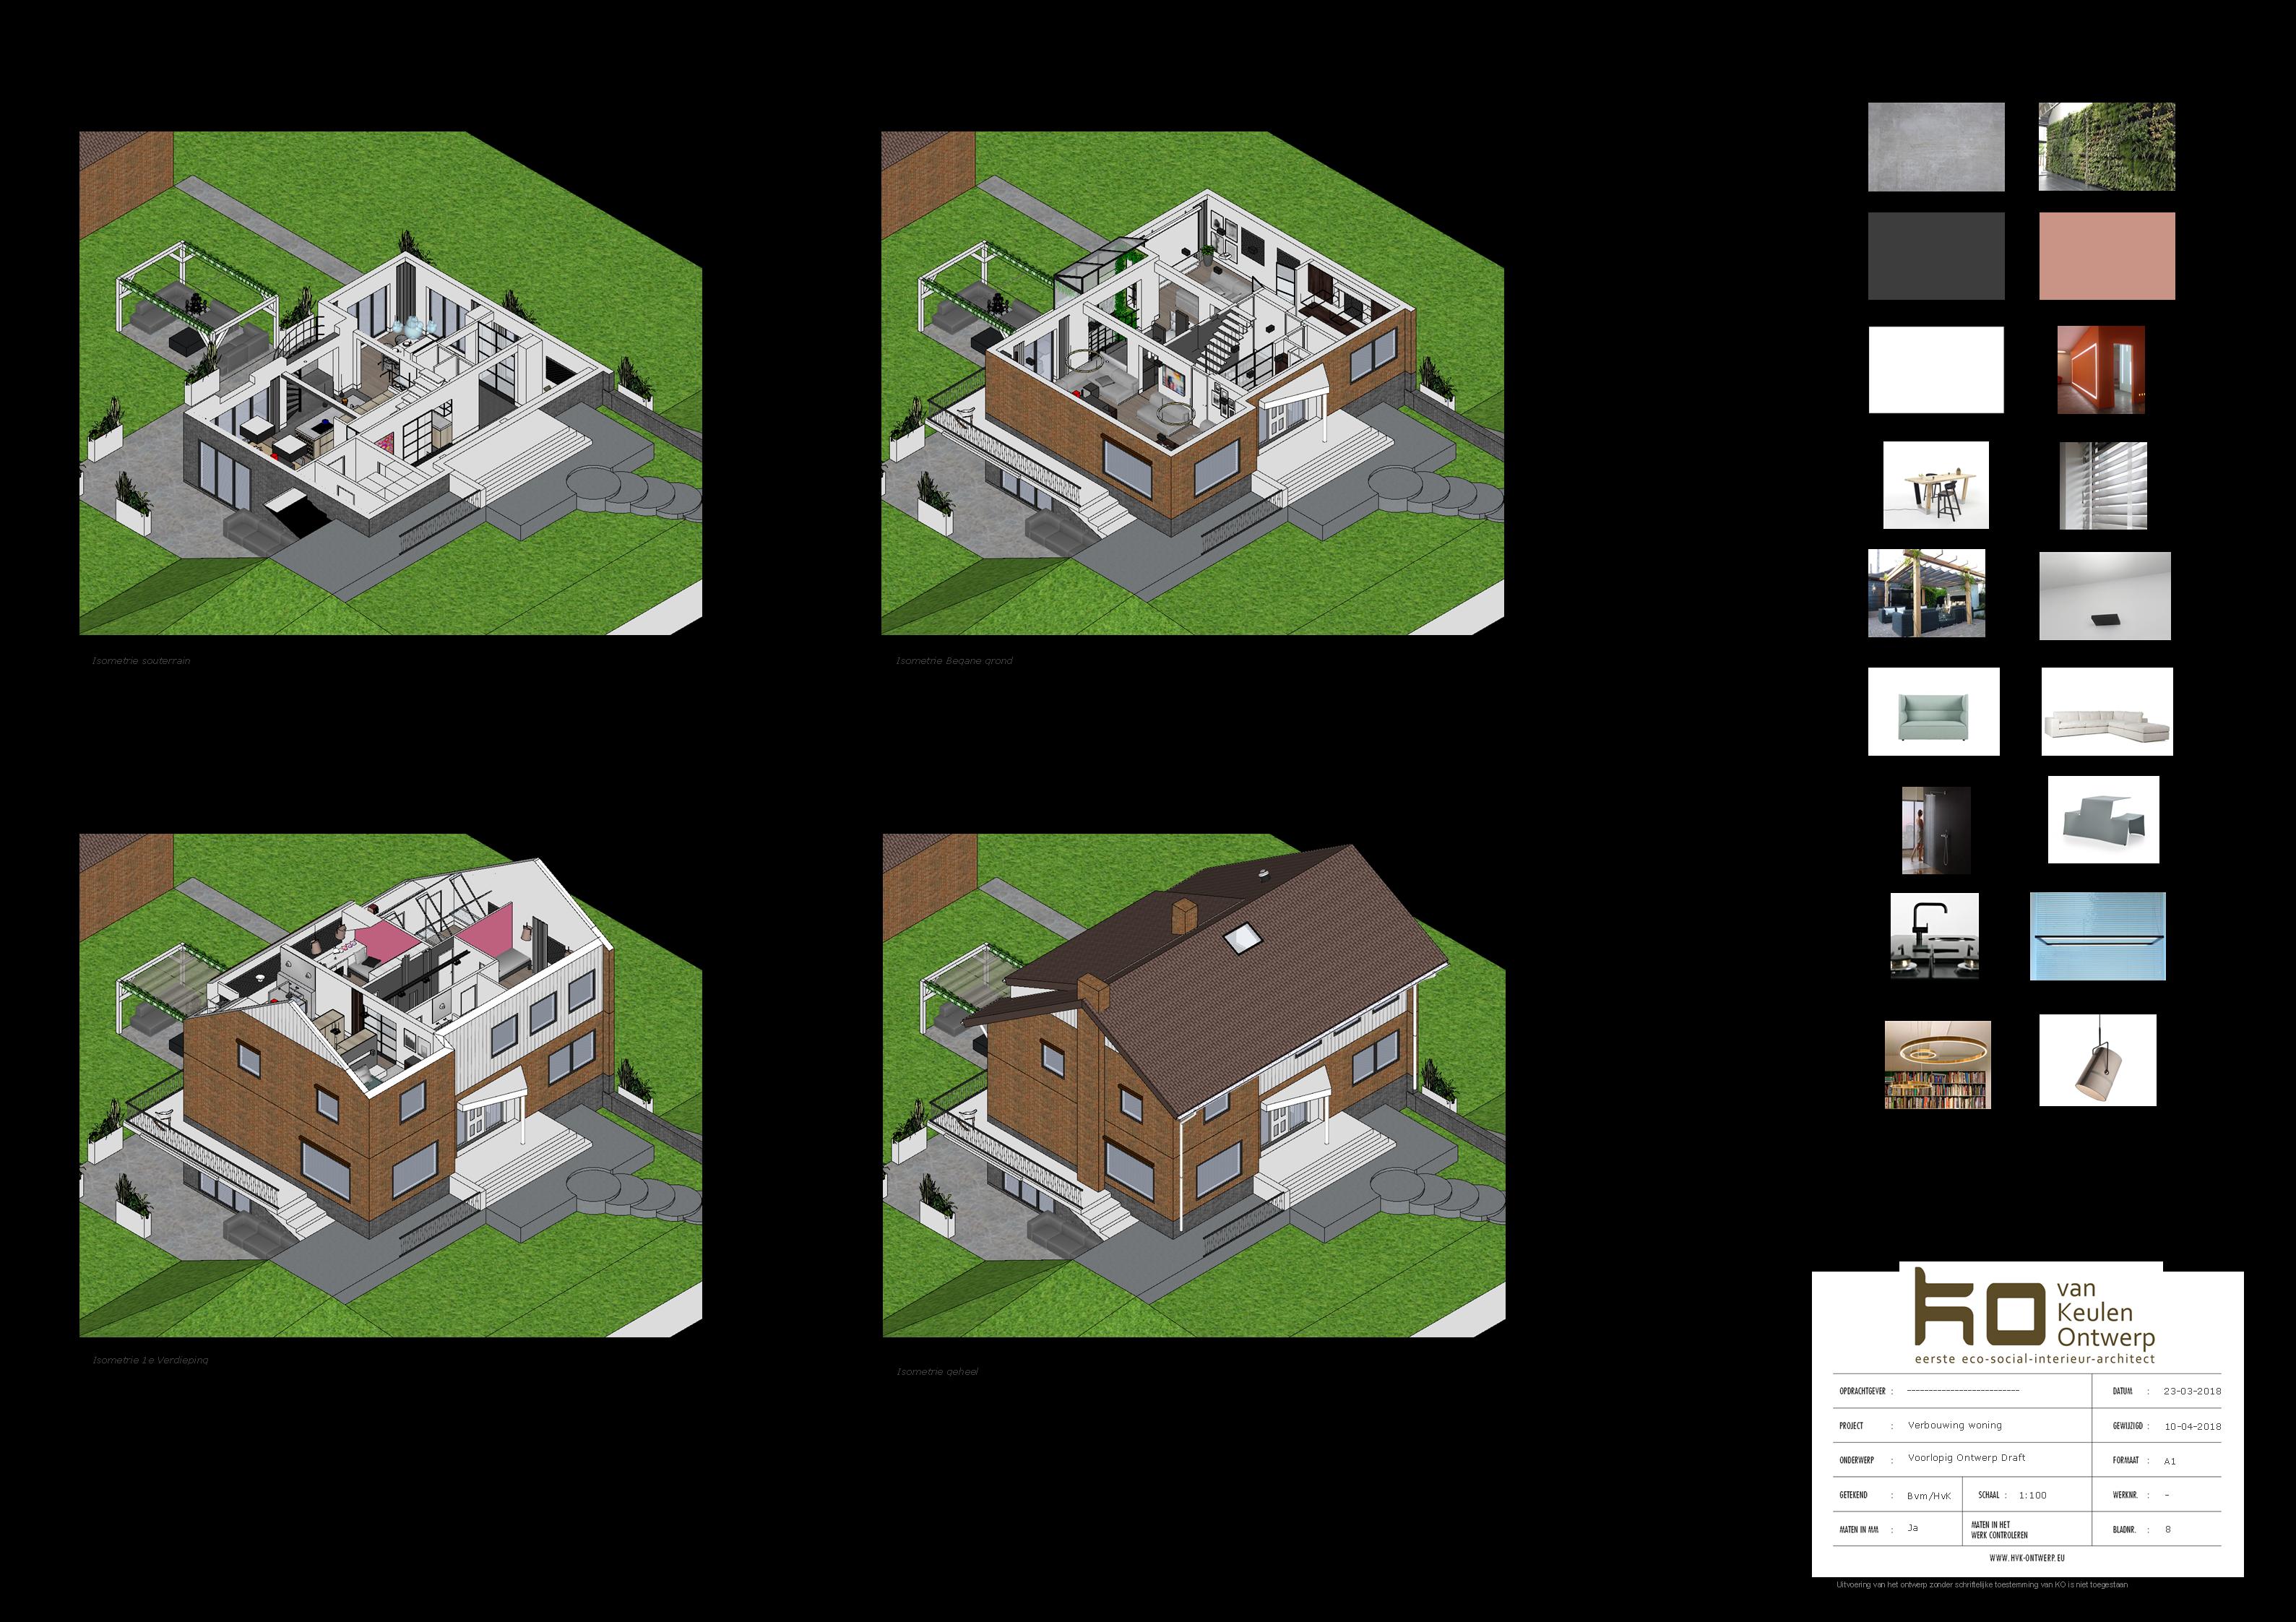 20180412 VO KO- -RT 10118 Huissen SITE_08